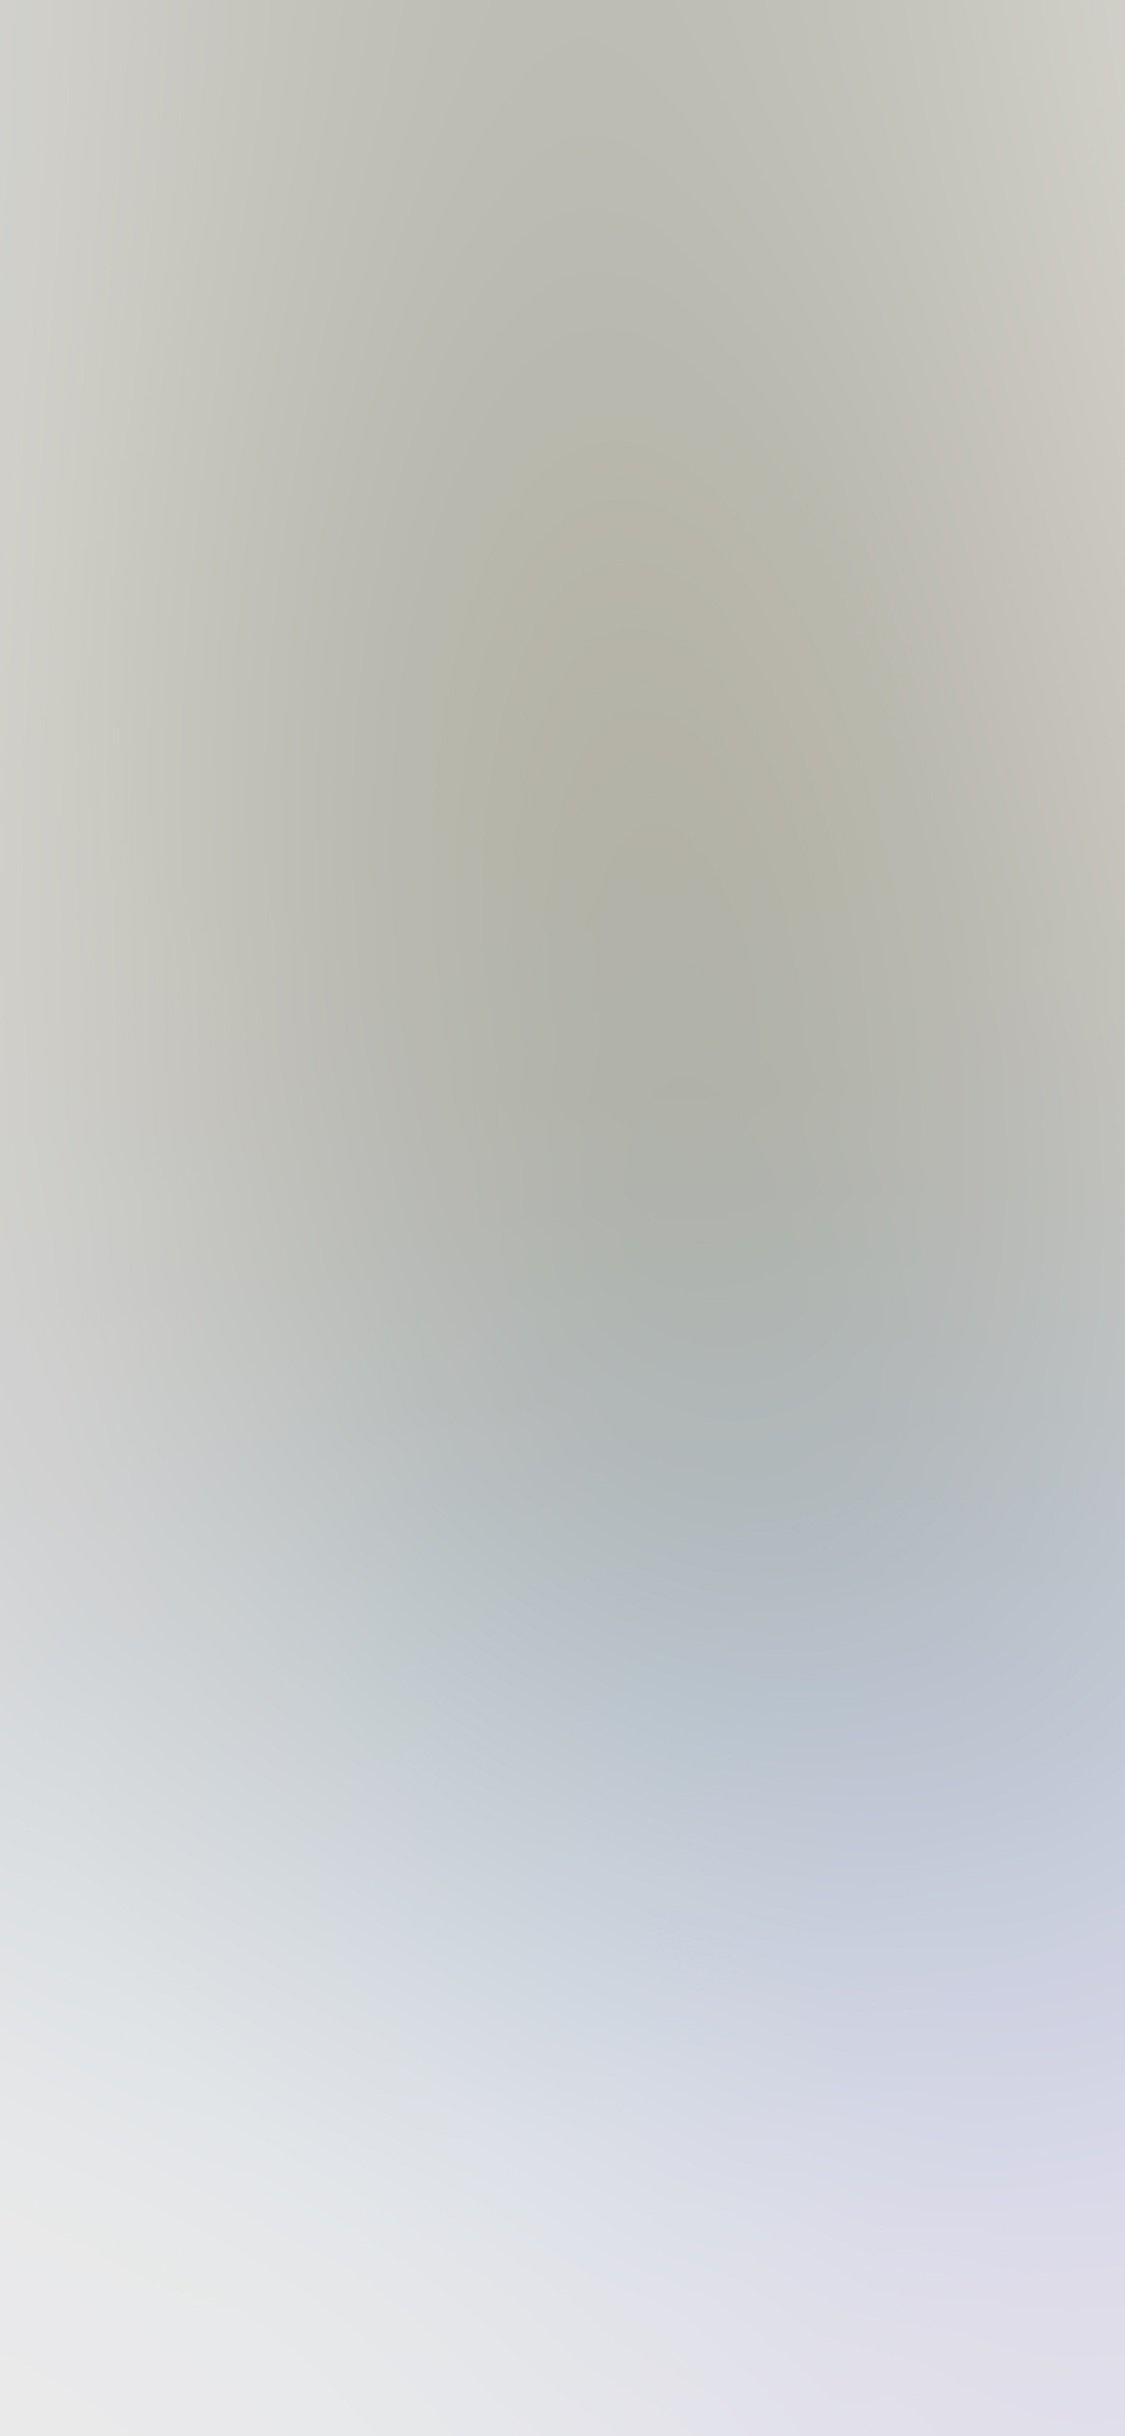 Sh56 White Oksusu Art Gradation Blur 41 Iphone Wallpaper - Iphone X Wallpapers White , HD Wallpaper & Backgrounds